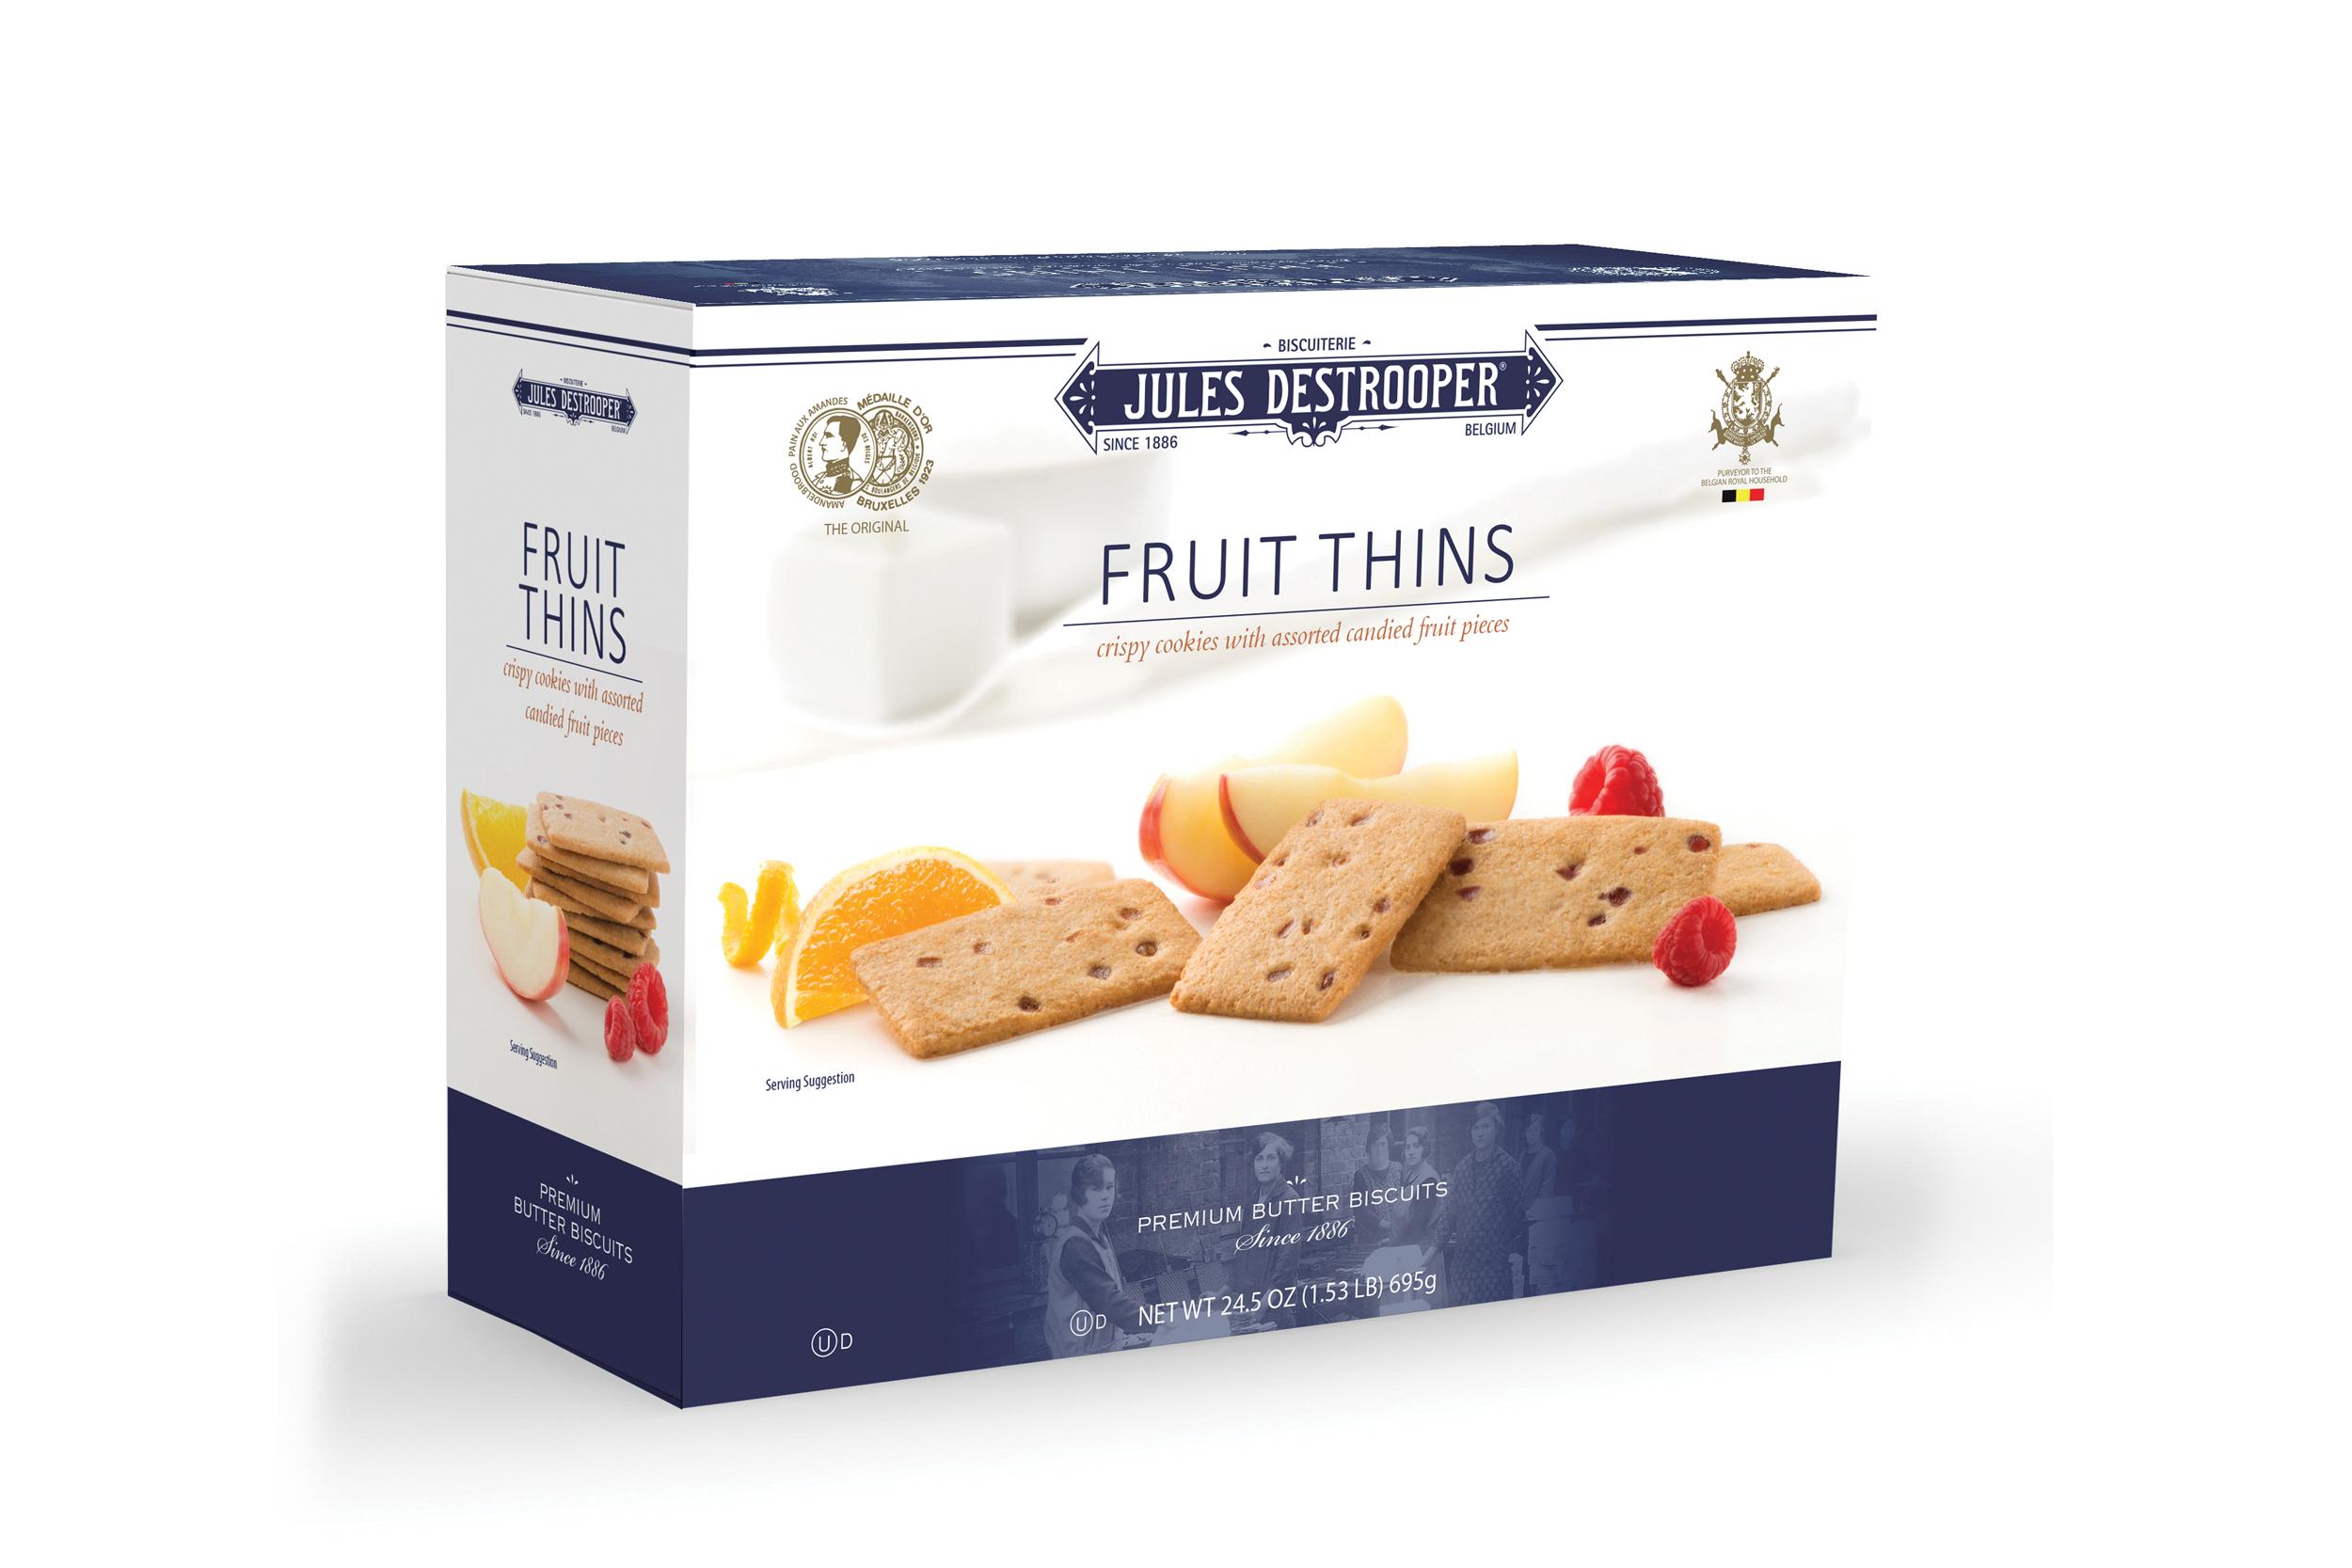 jules_destrooper_fruitthins_packaging